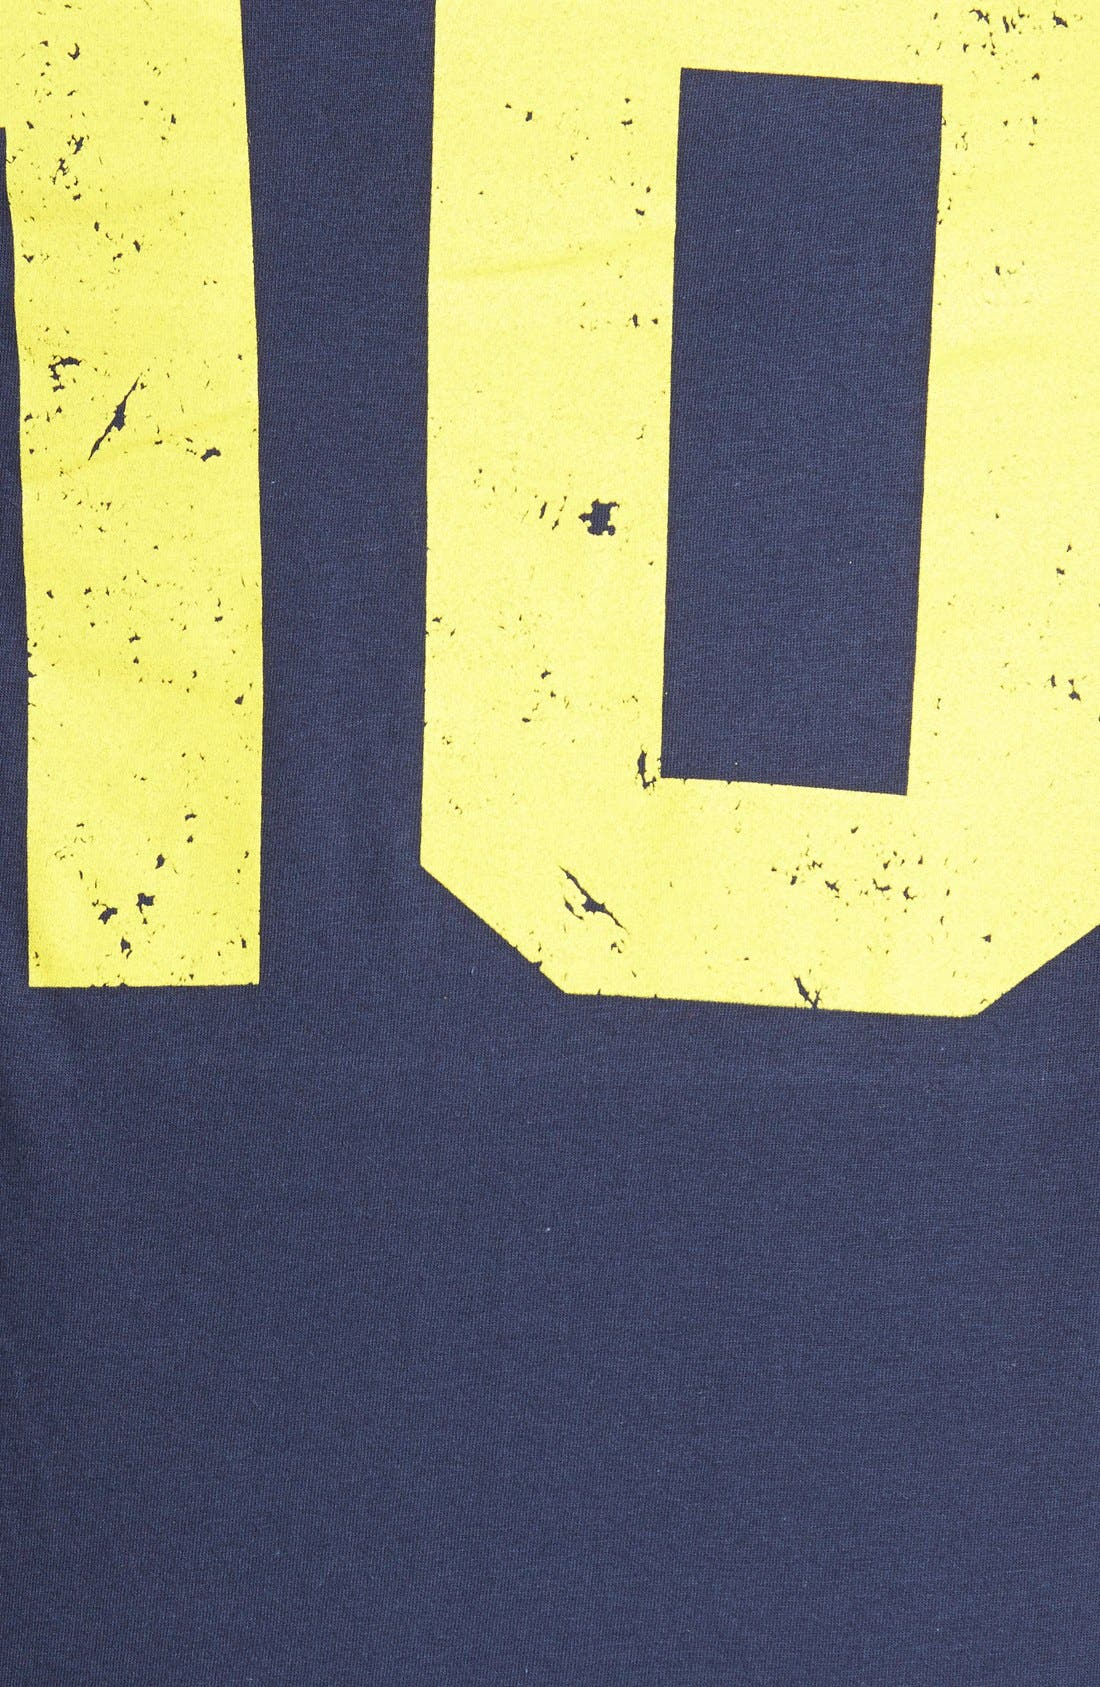 RETRO BRAND,                             'Michigan Wolverines - Tom Brady' Graphic T-Shirt,                             Alternate thumbnail 2, color,                             457